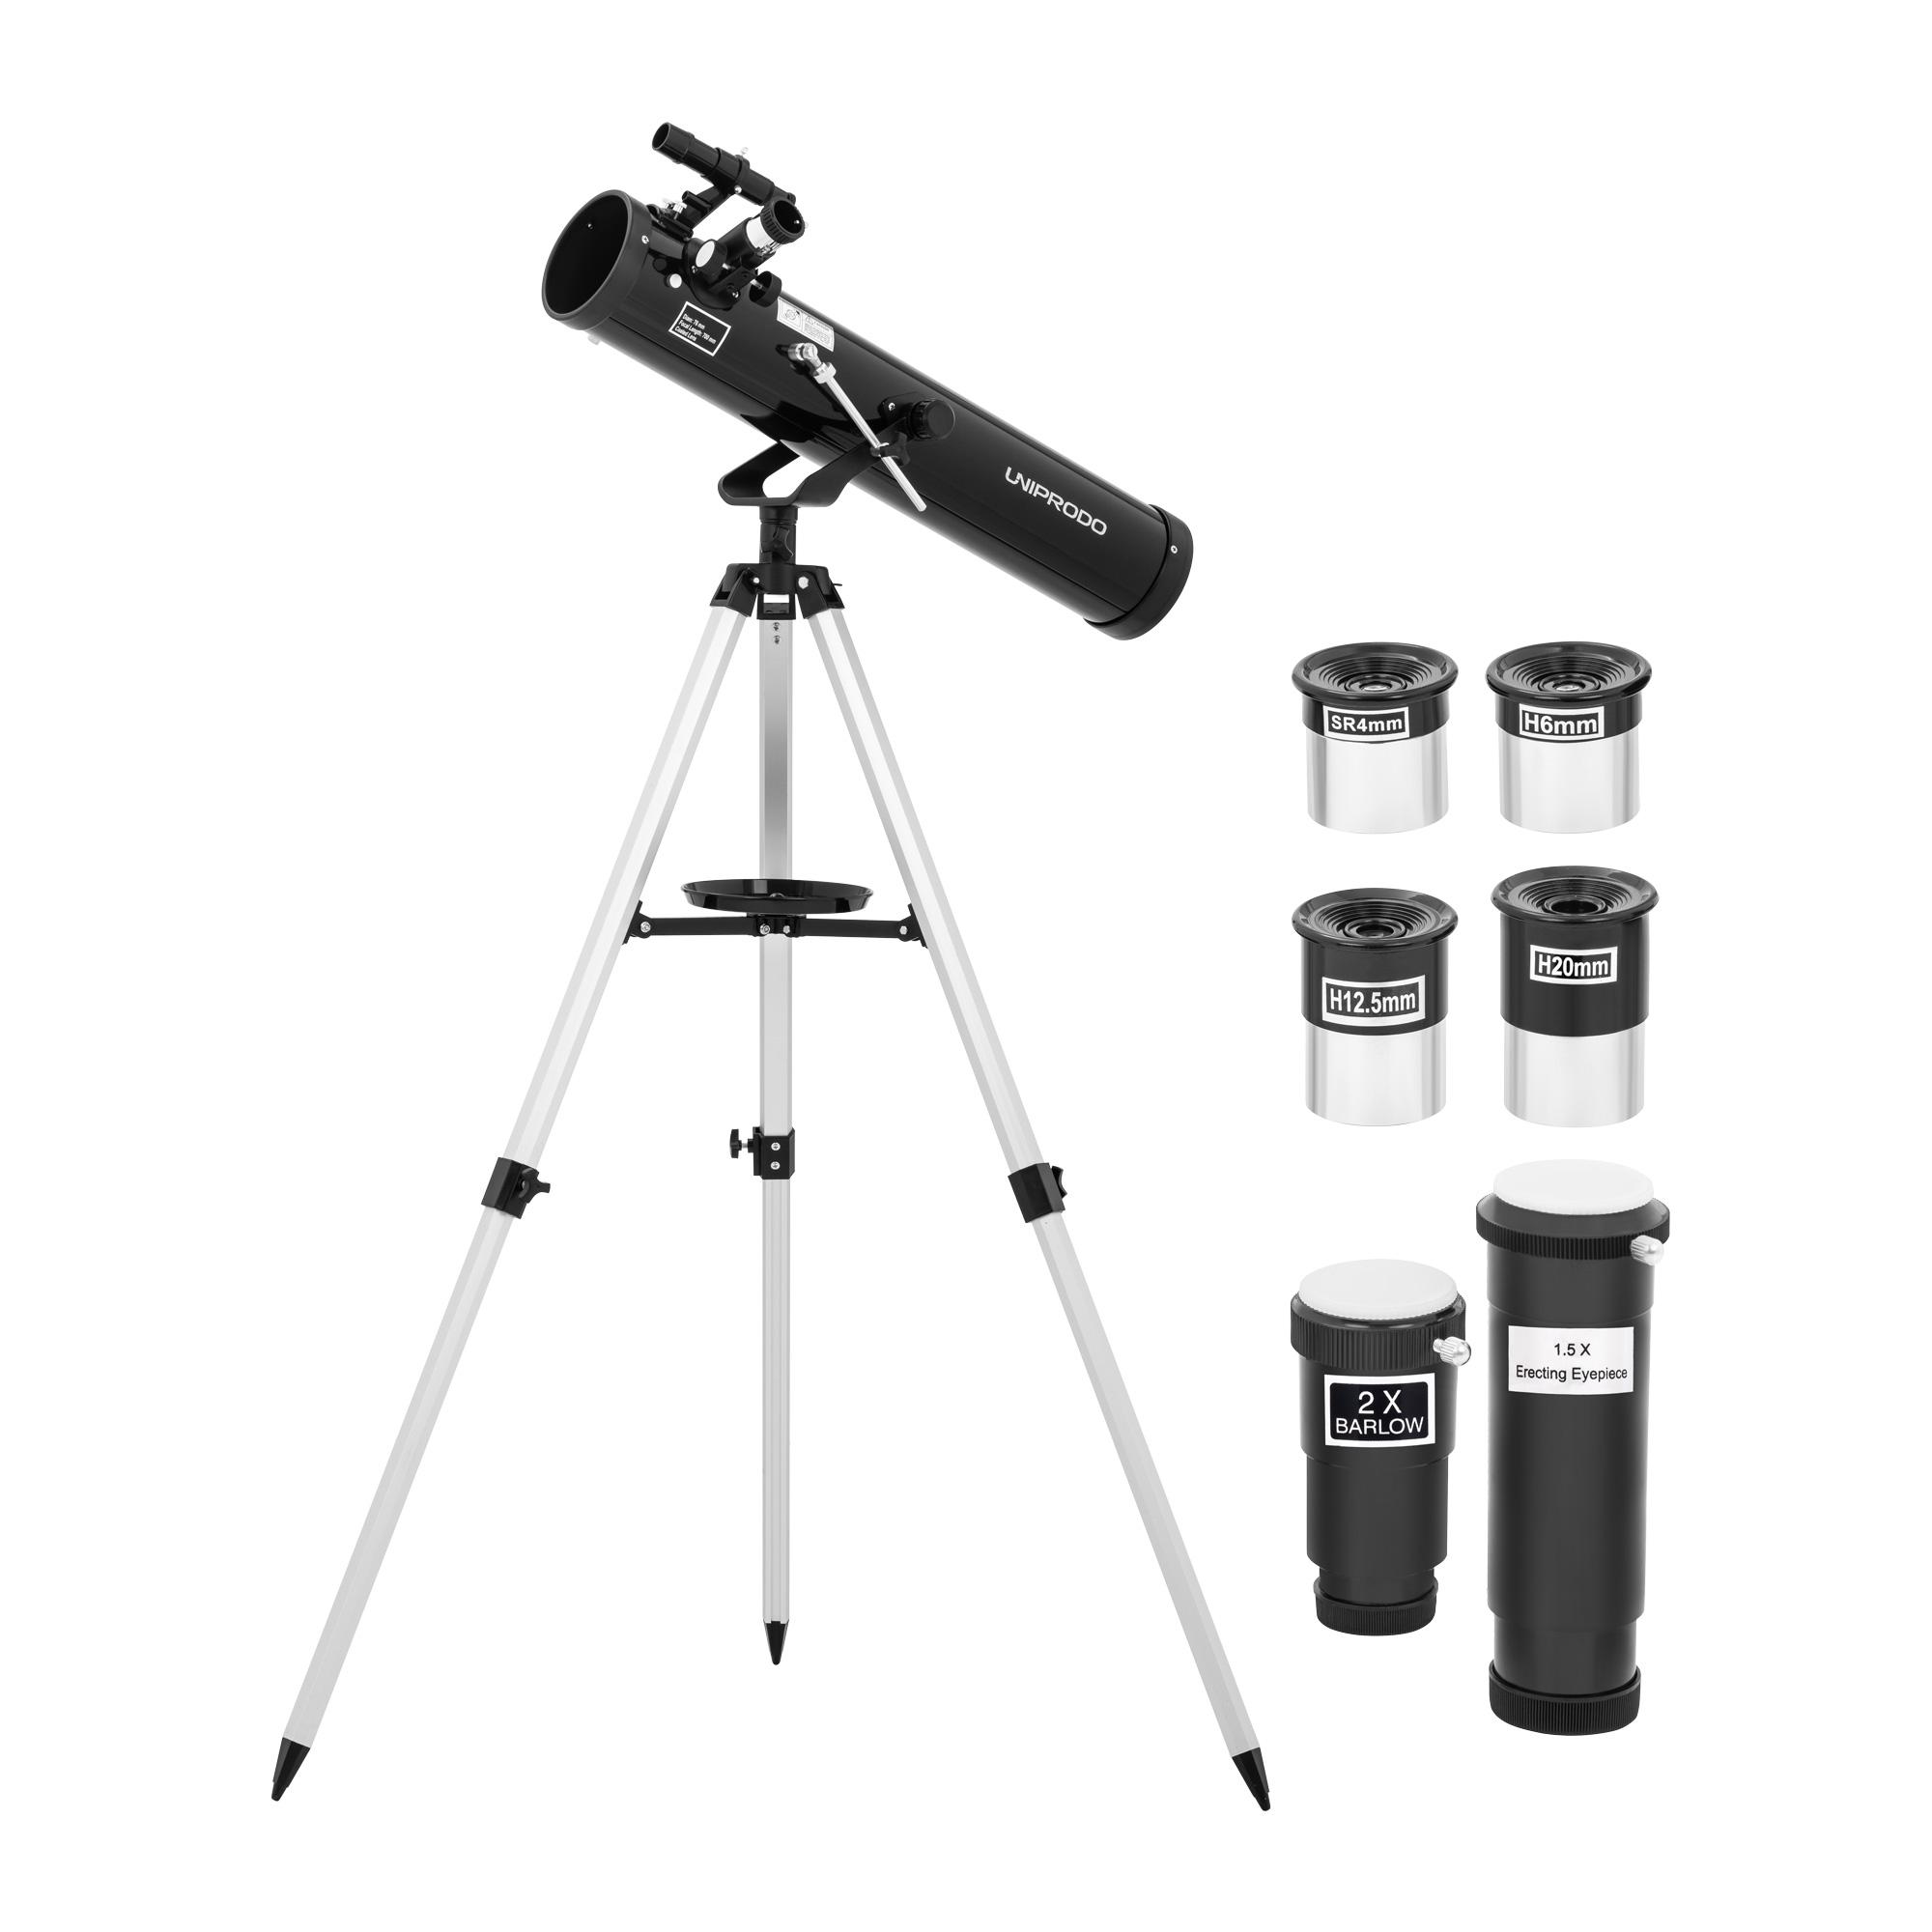 Uniprodo Teleskop - Ø 76 mm - 700 mm - Tripod-Stativ UNI_TELESCOPE_06